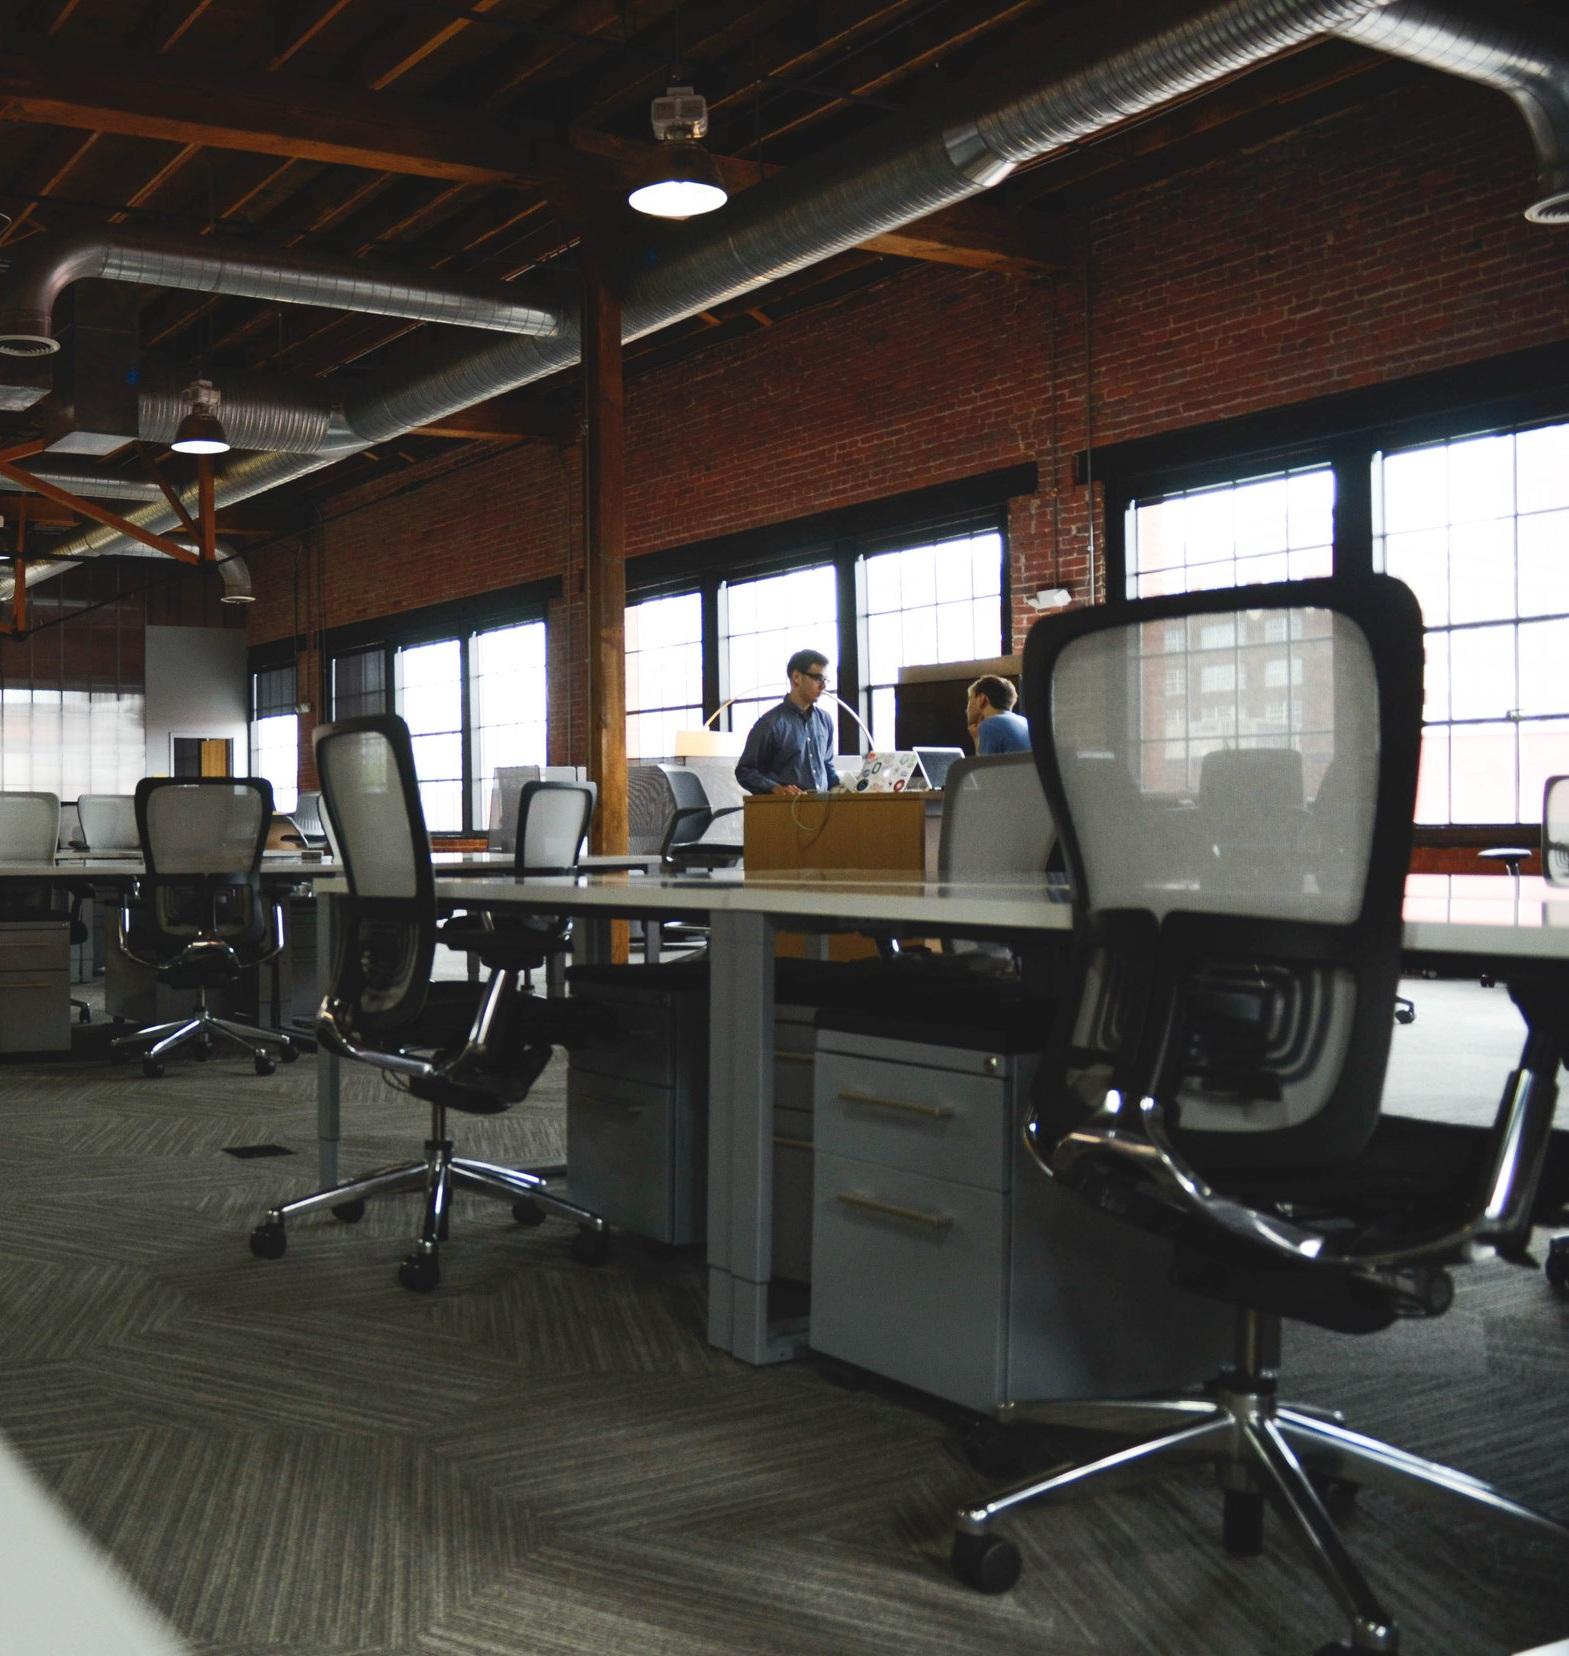 Canva+-+Two+Men+Having+Conversation+Next+to+Desk+in+Building.jpg